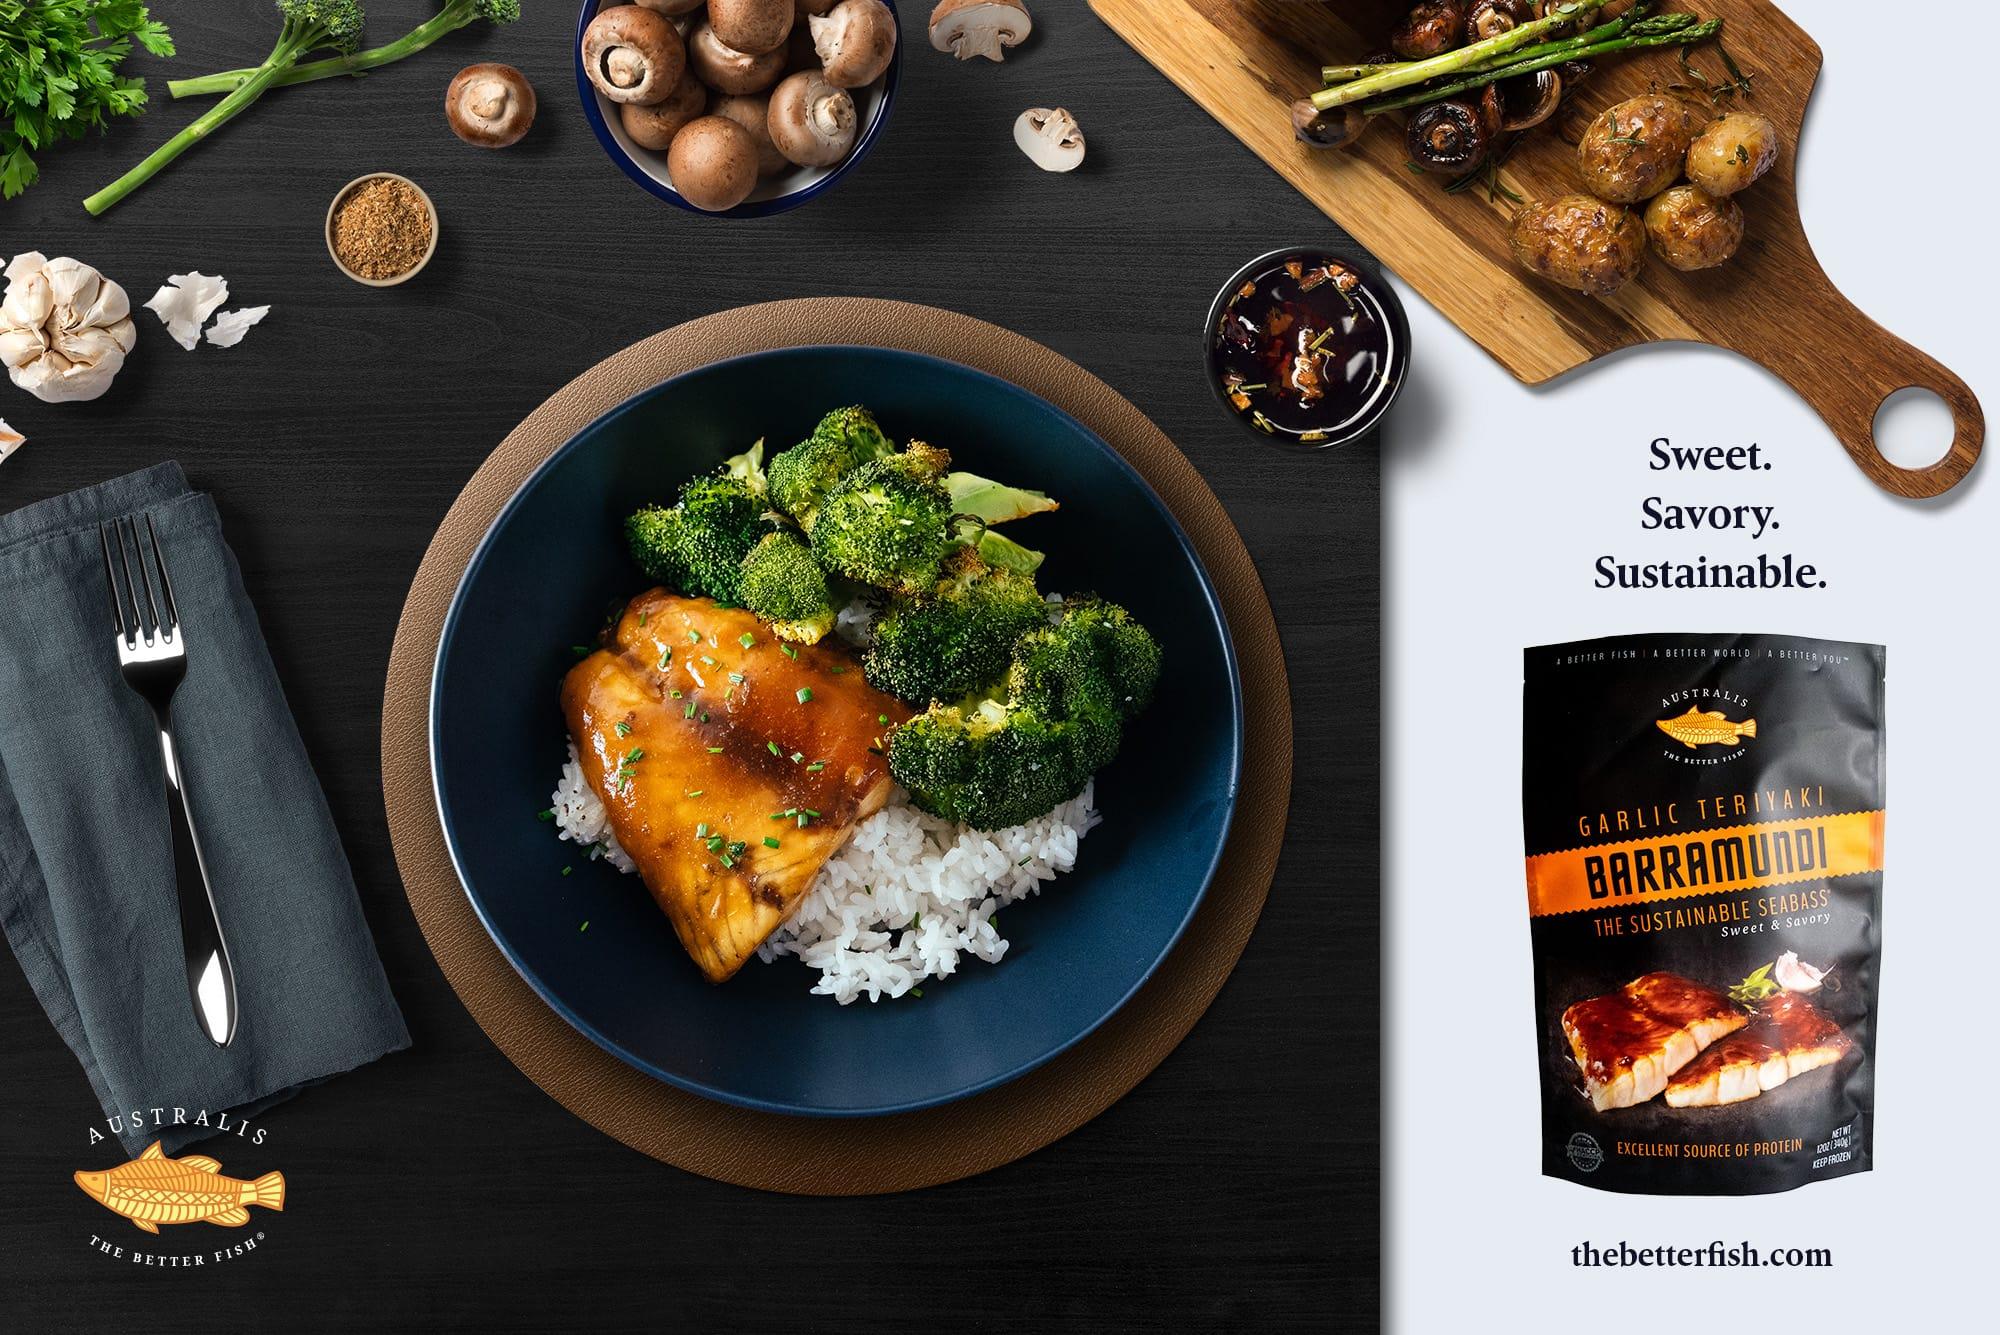 Australis debuts Garlic Teriyaki Barramundi to its retail line with Whole Foods Market